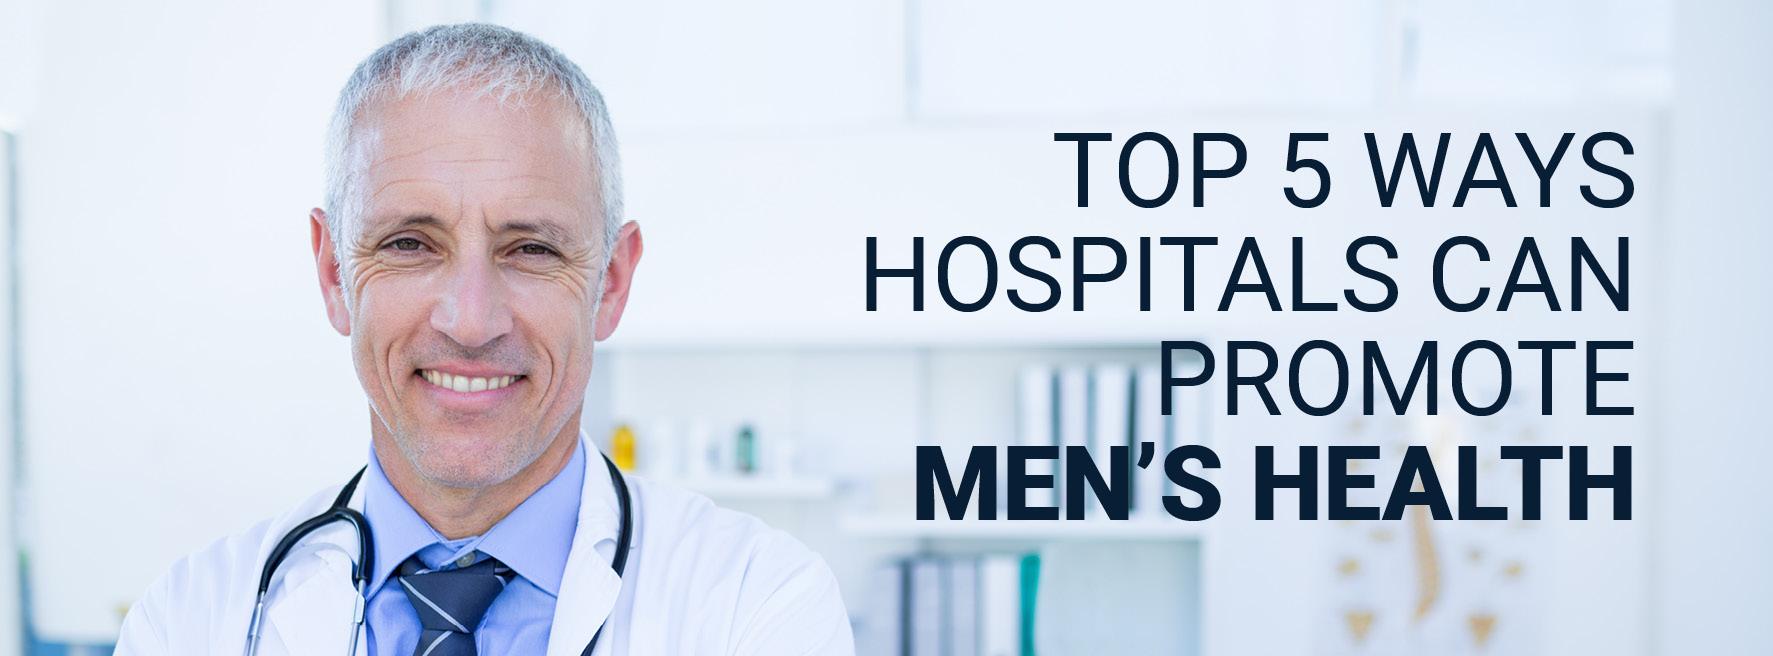 Top 5 Ways Hospitals Can Promote Men's Health